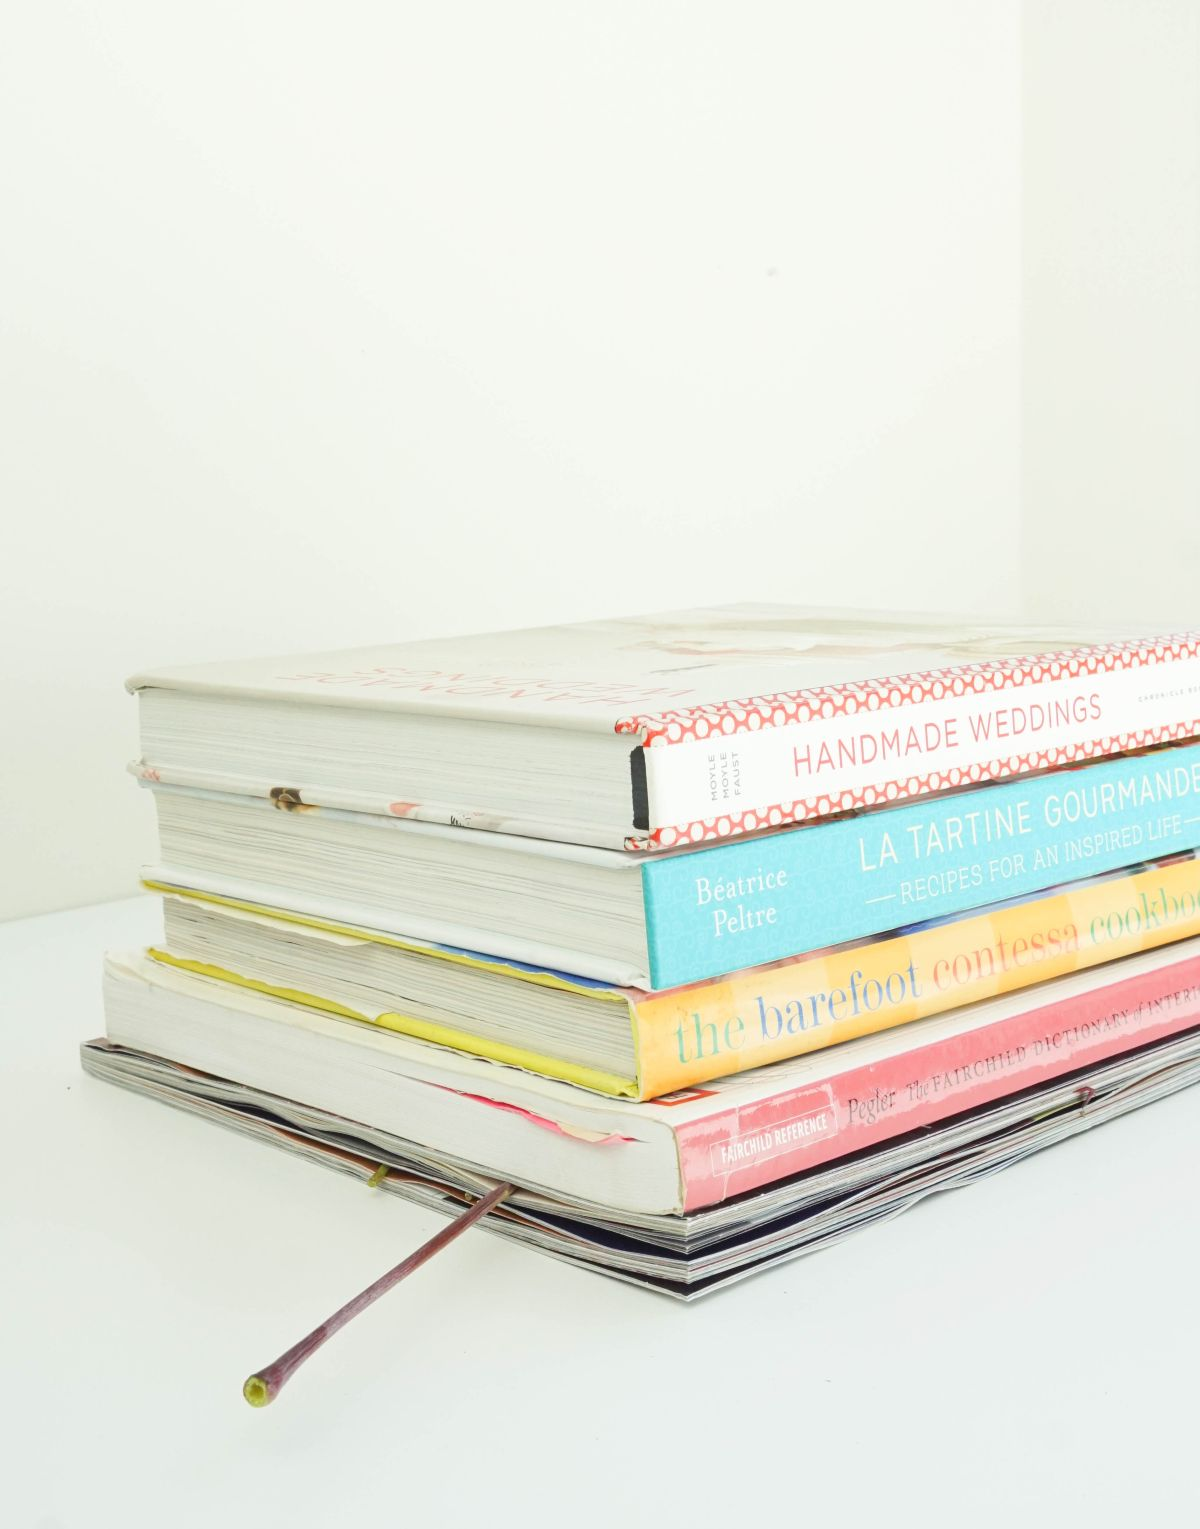 Dry under books